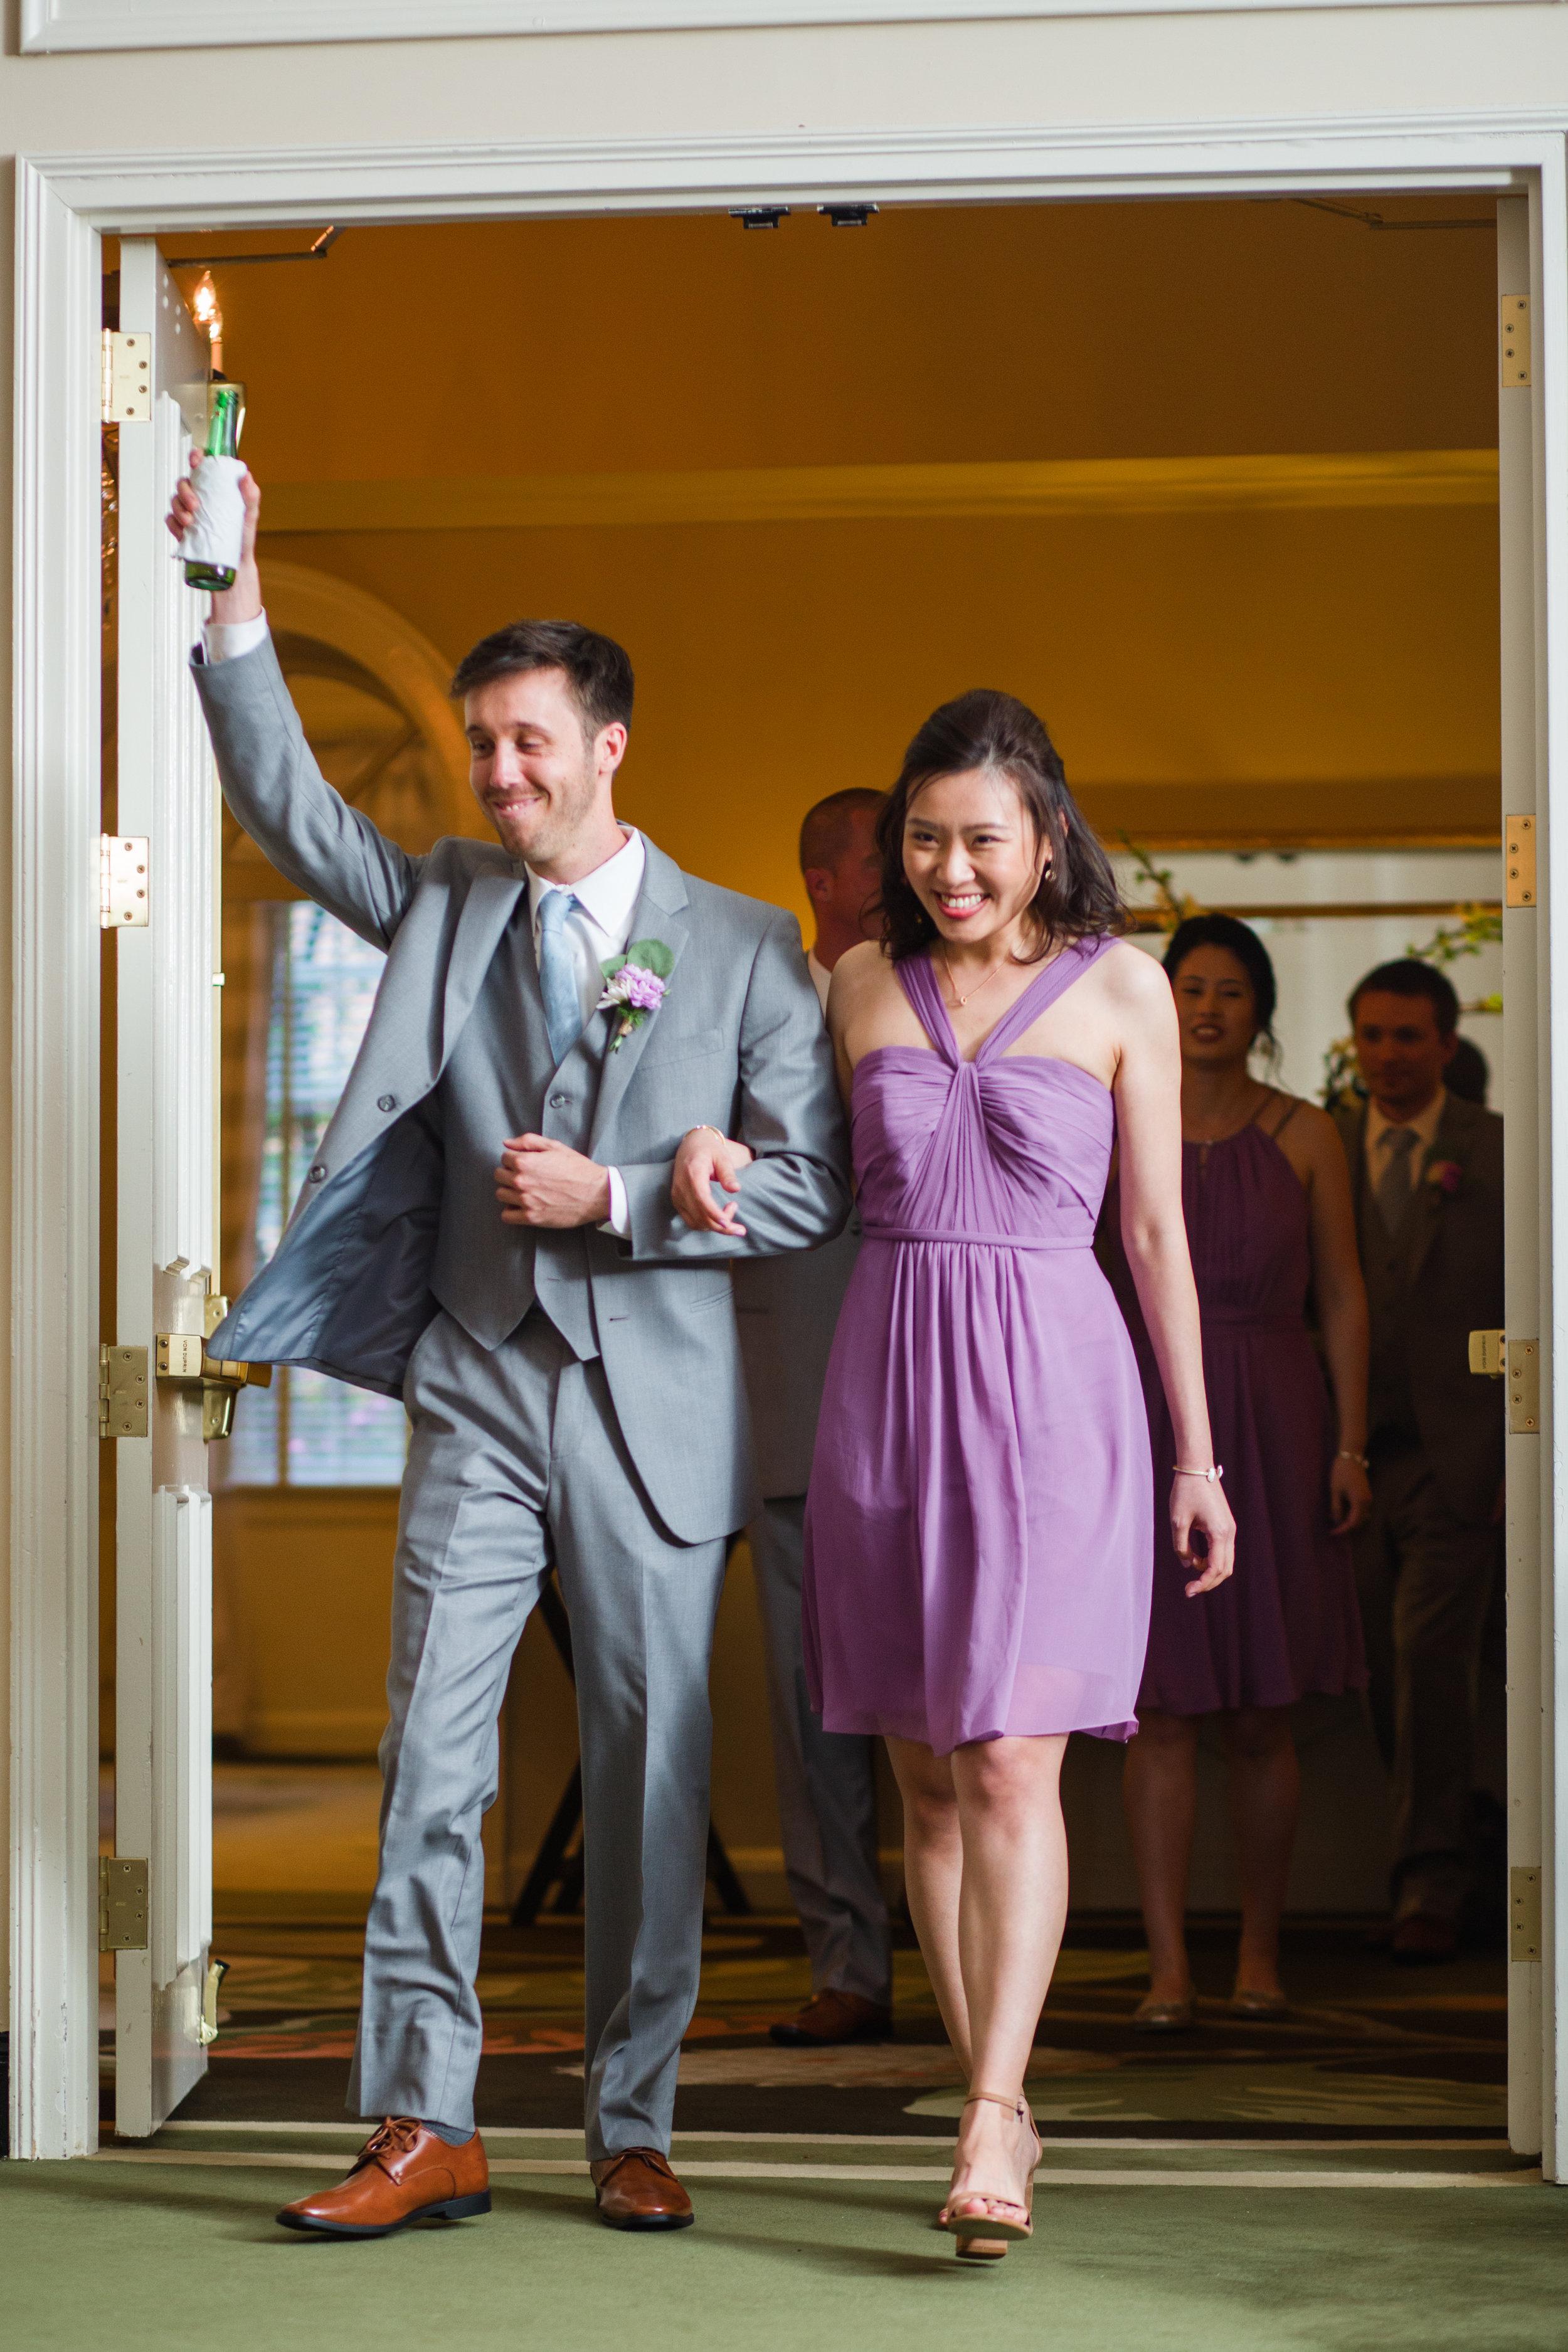 2017_04_30_jenny_jonathans_wedding_reception-45.jpg